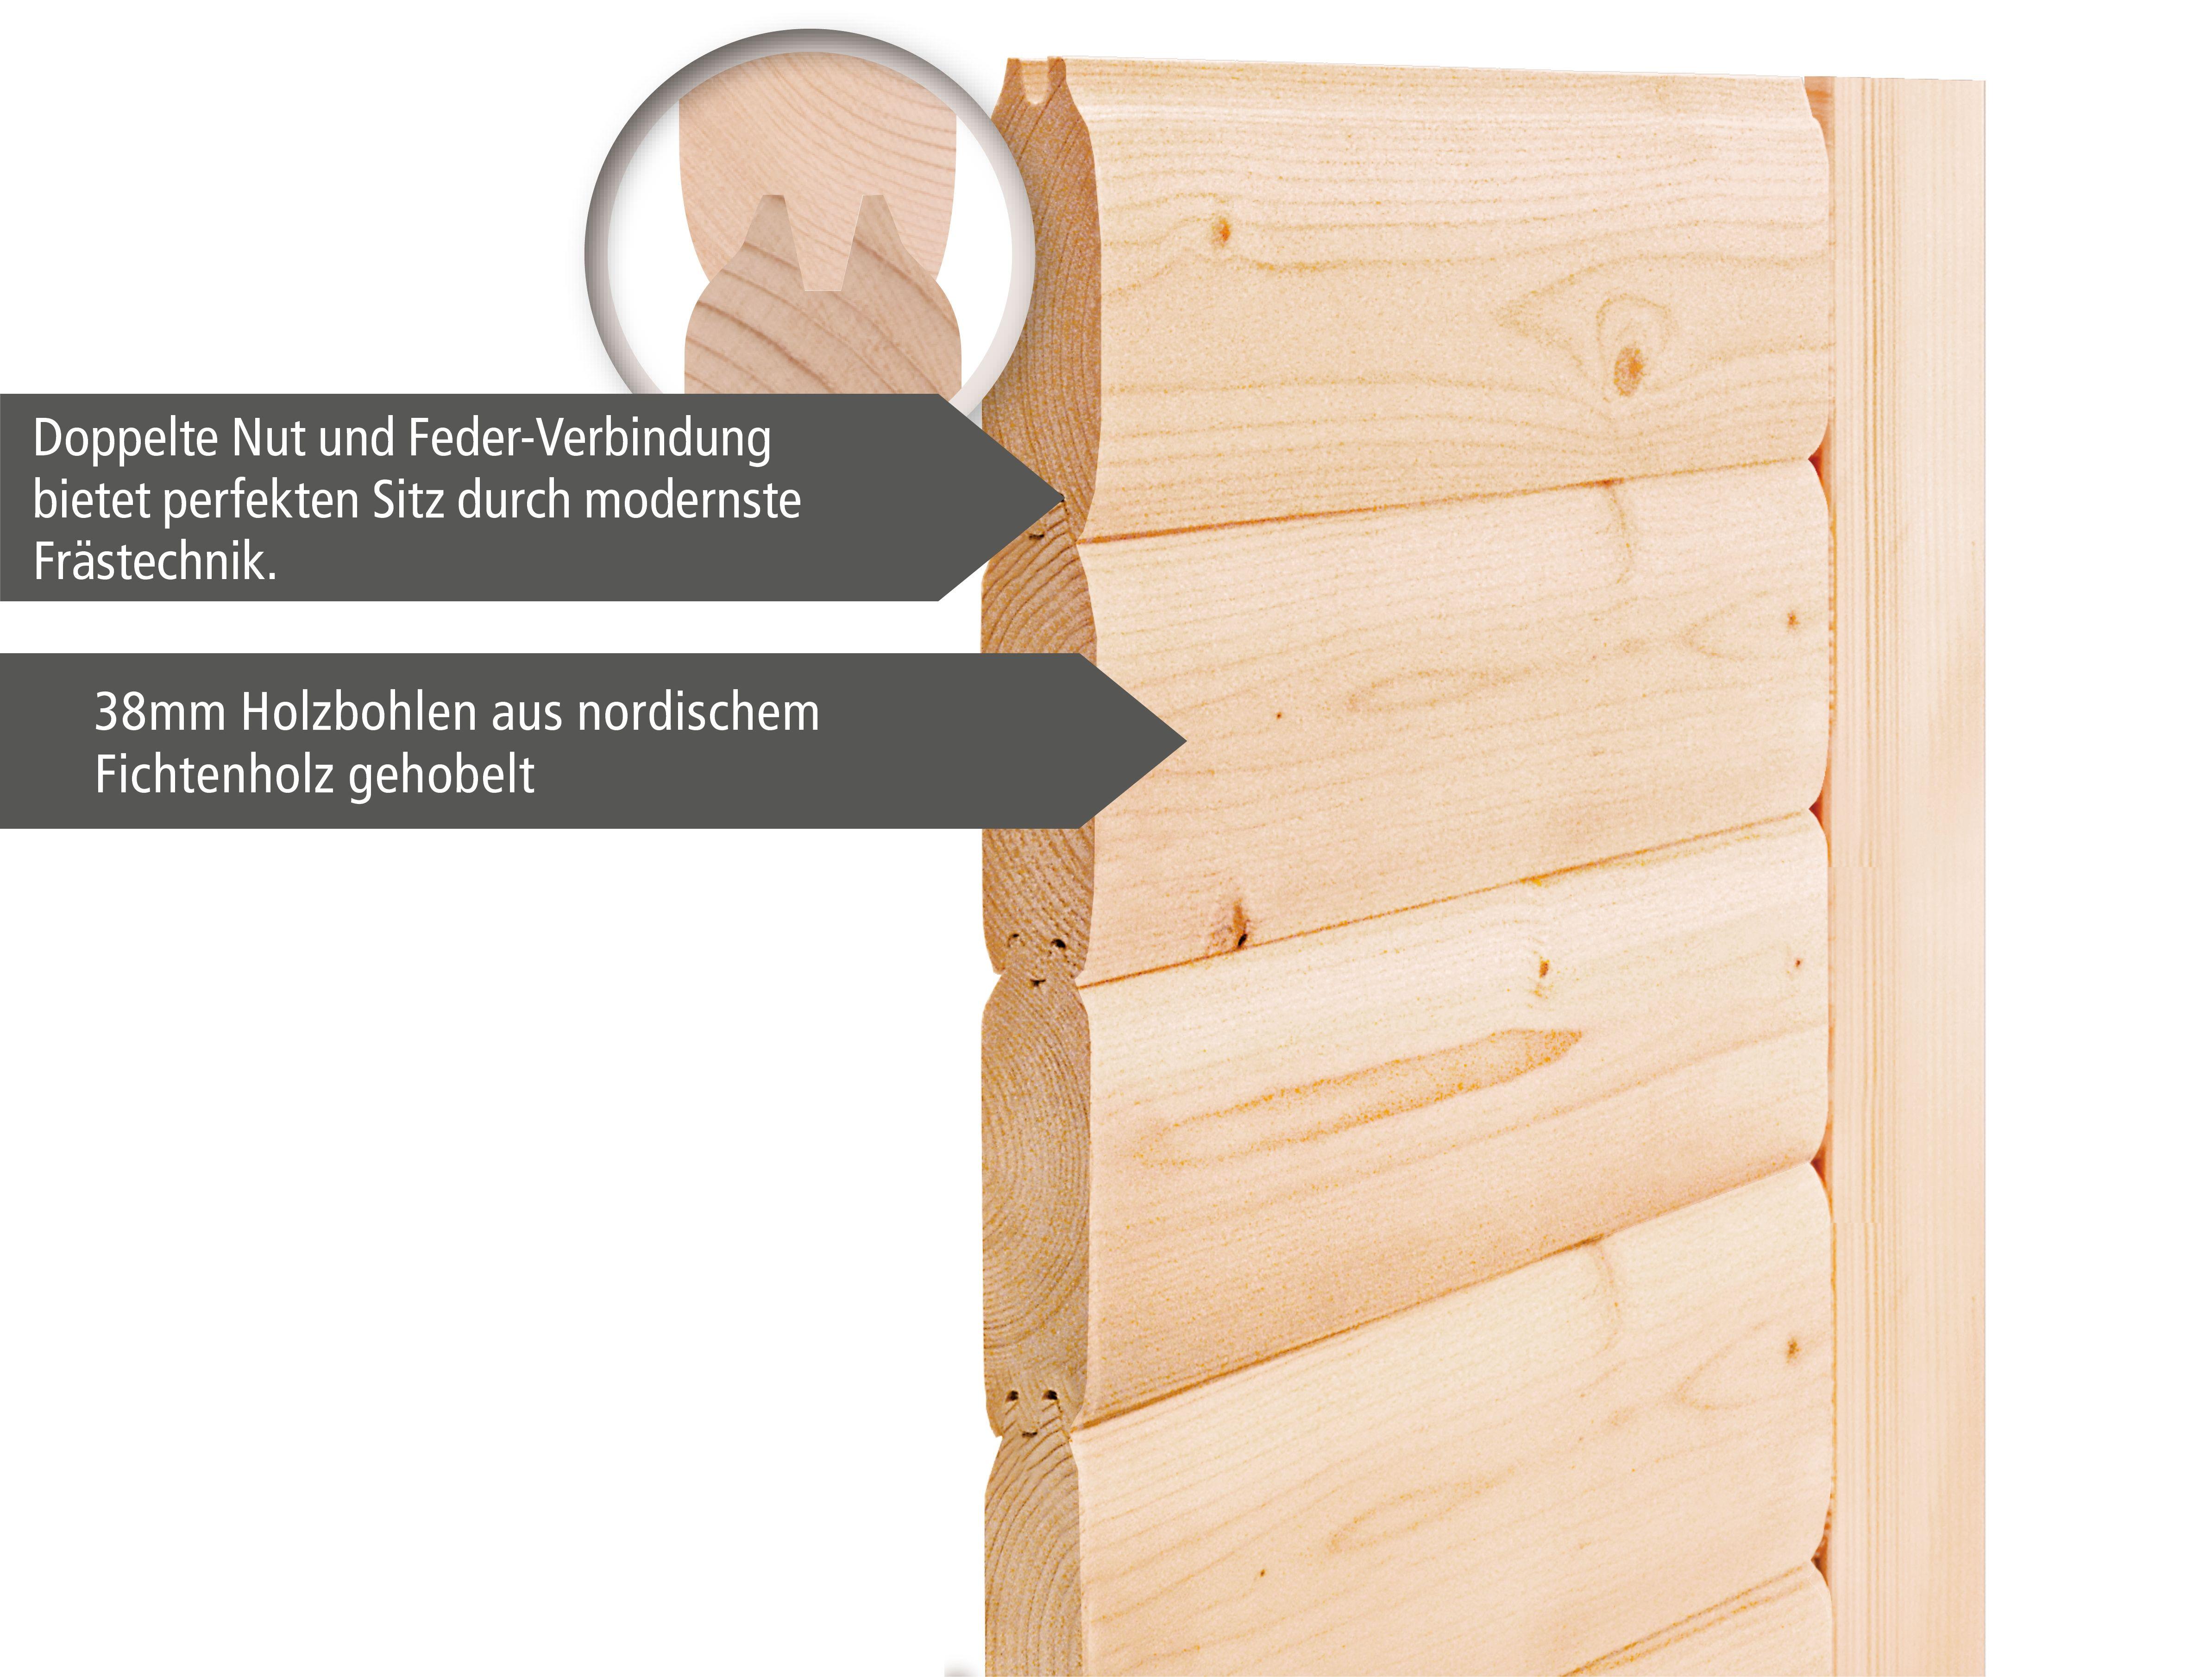 Woodfeeling Sauna Lisa 38mm Ofen 9kW intern Tür Modern Bild 6